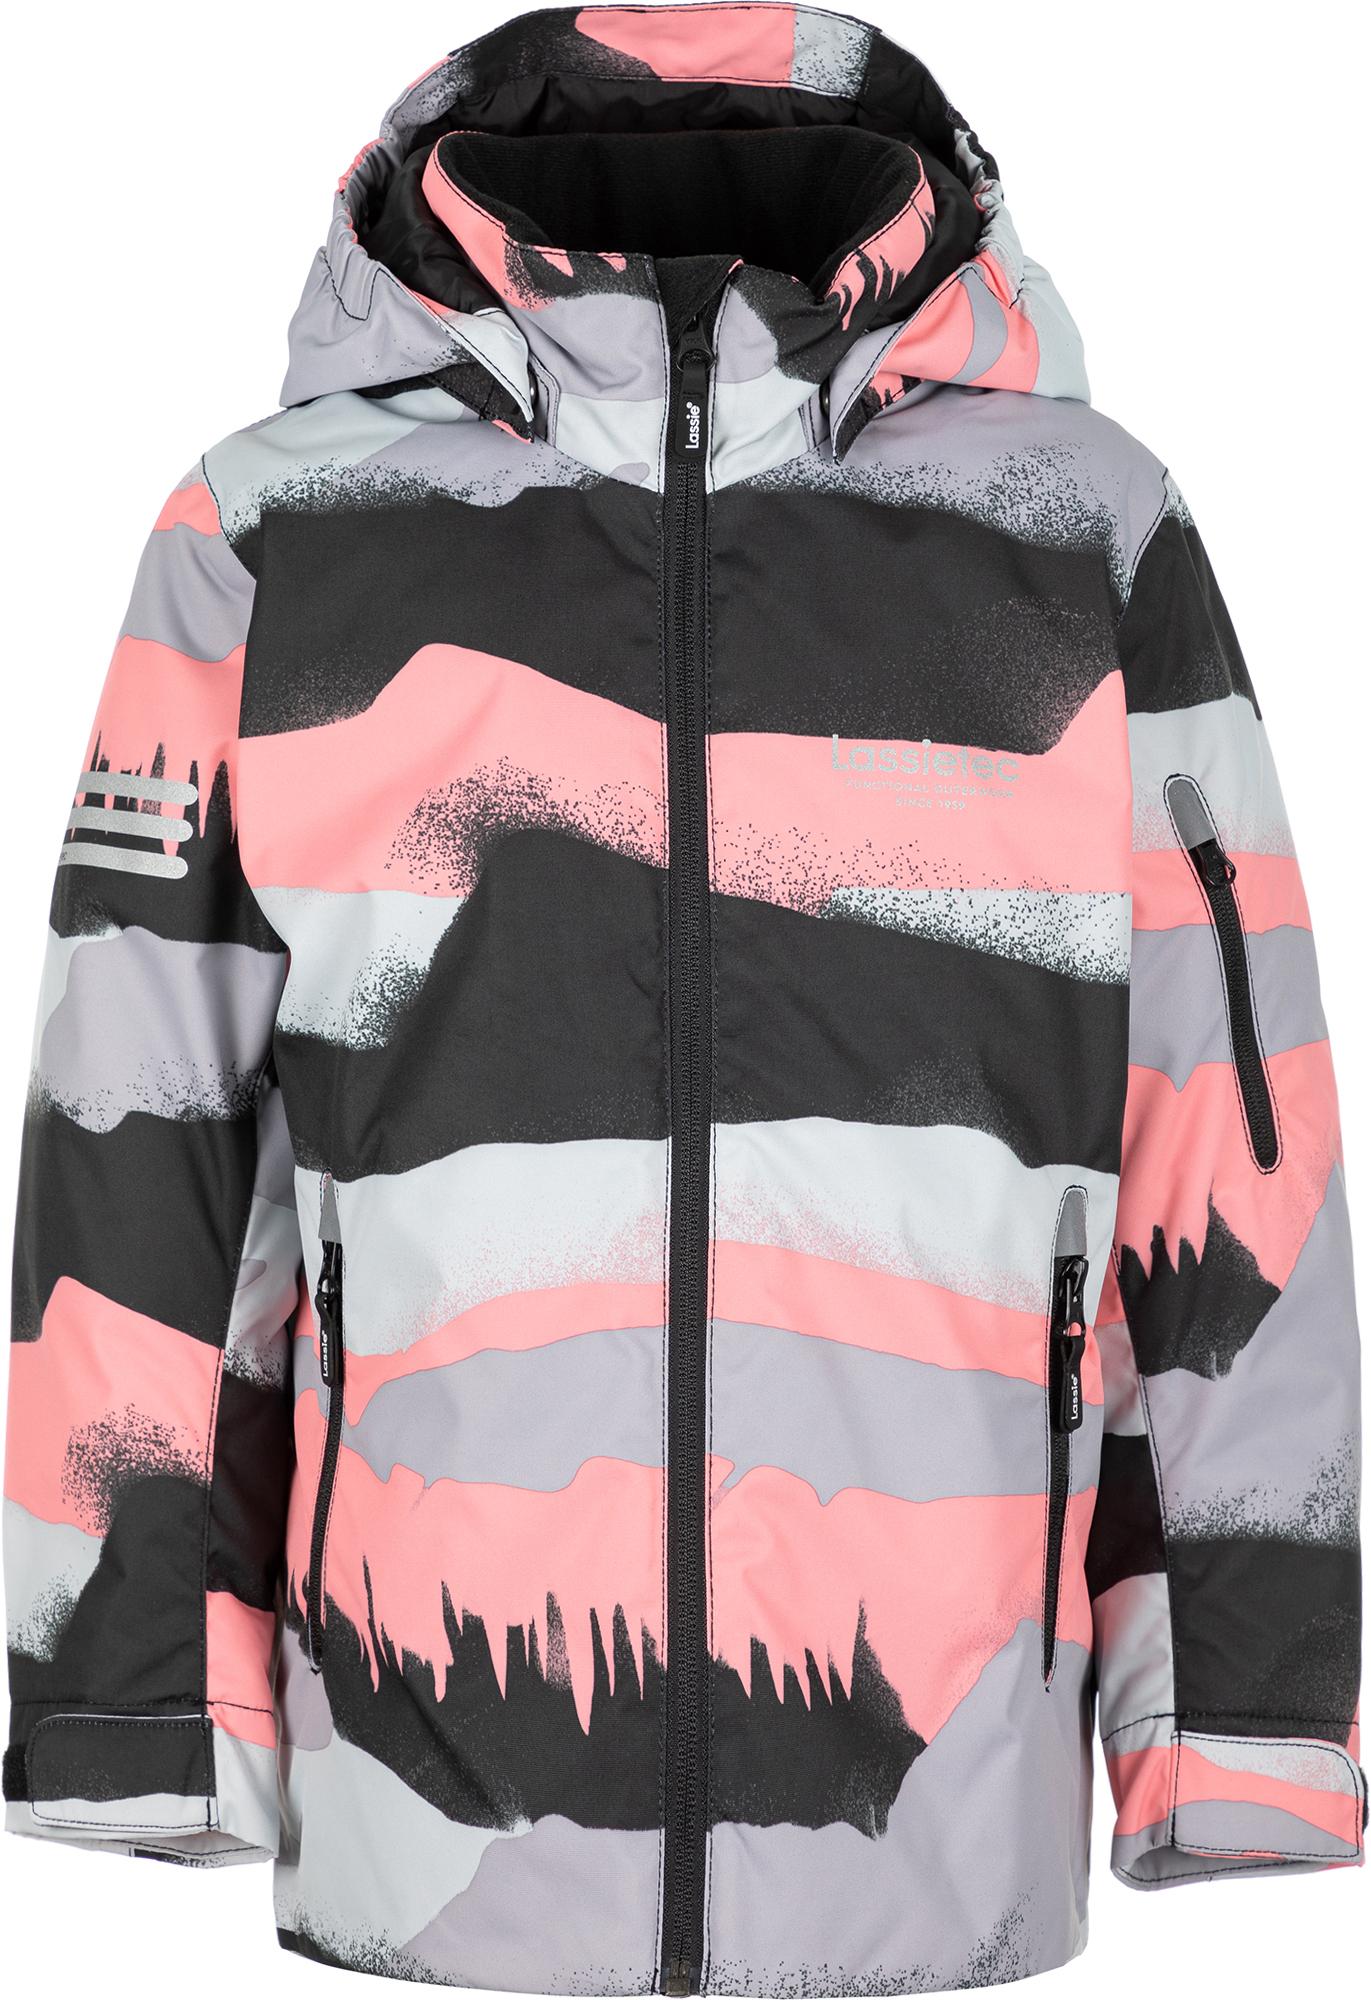 цена на Lassie Куртка утепленная для девочек Lassie Timka, размер 128